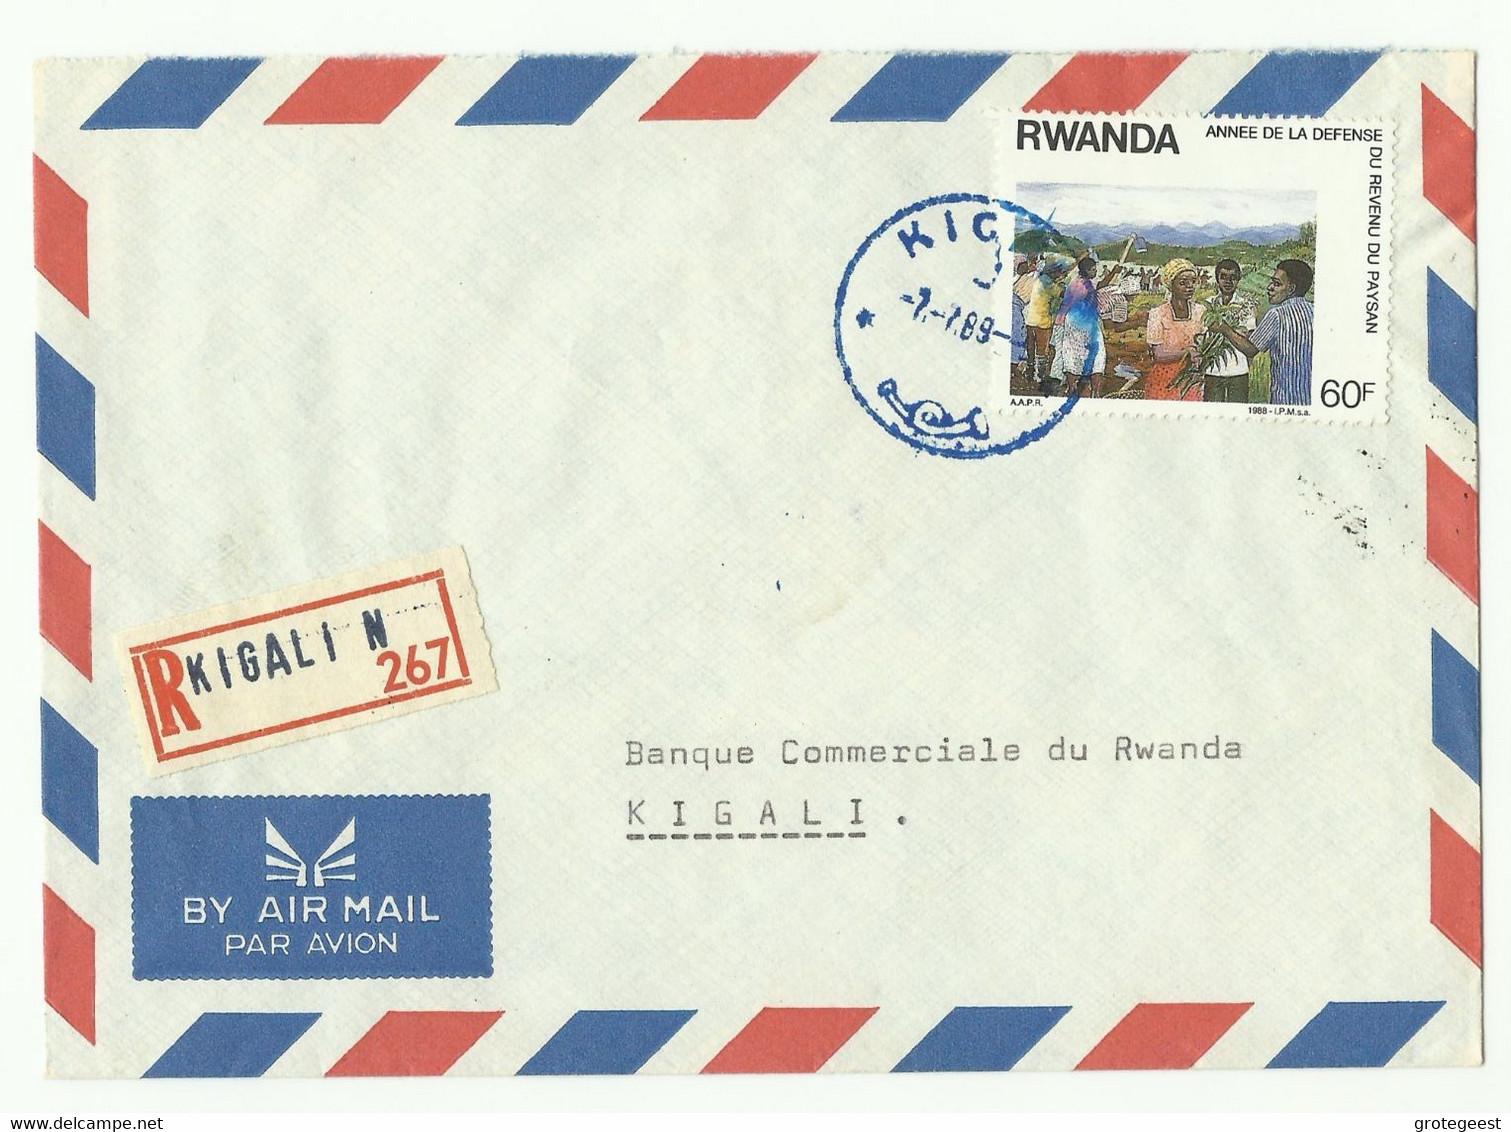 Lettre Recommandée De KIGALI 1989 Vers Kigali - 16165 - Sonstige